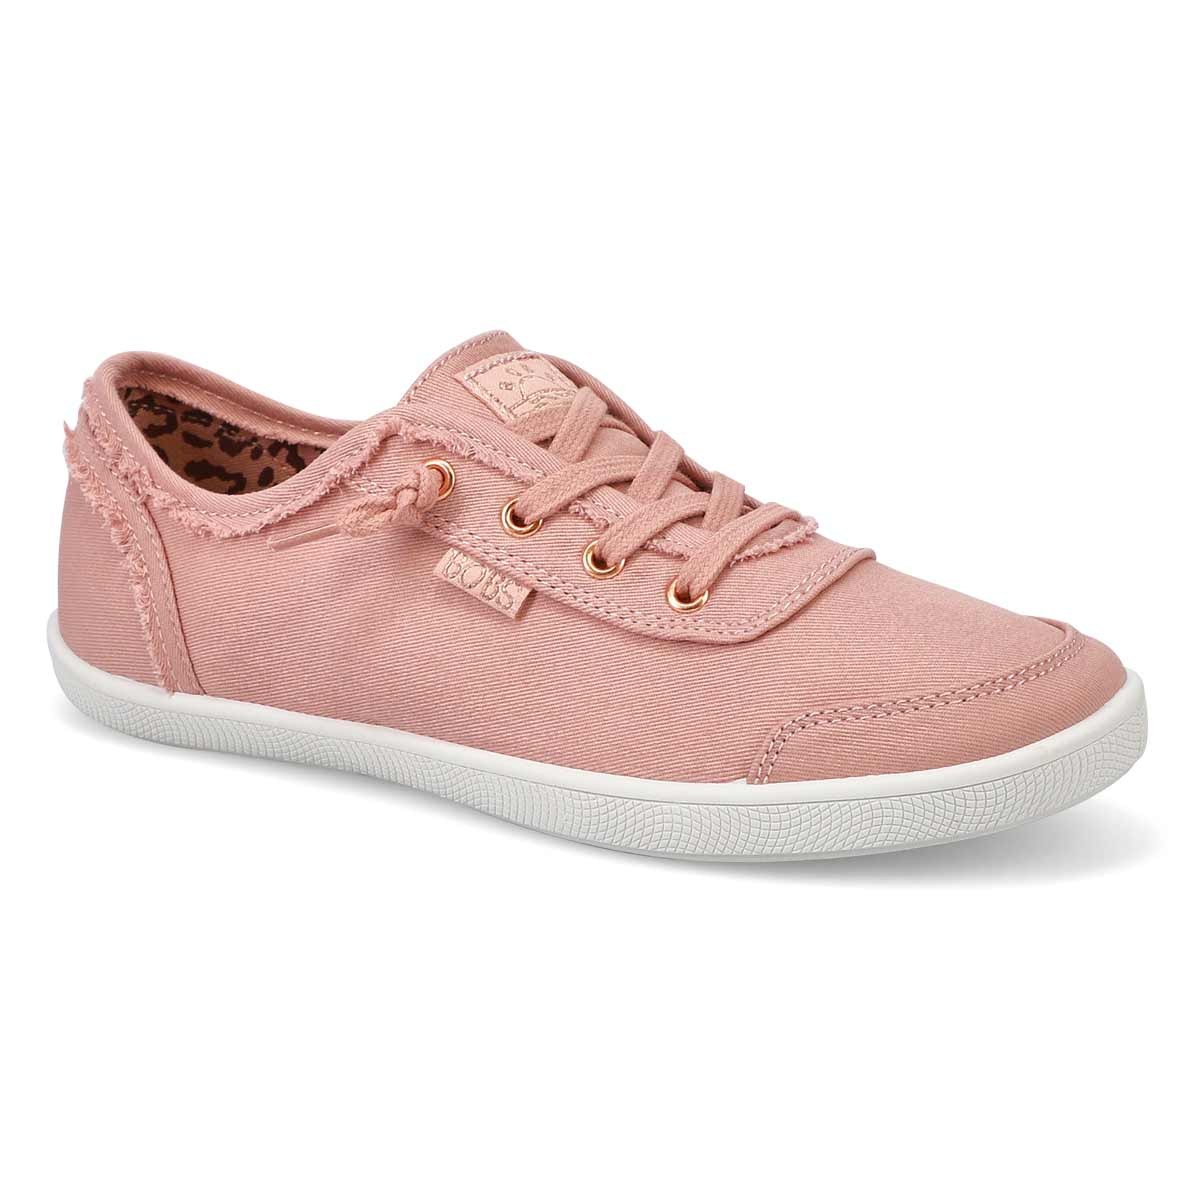 Womens' Bobs B Cute sneakers - pink/multi